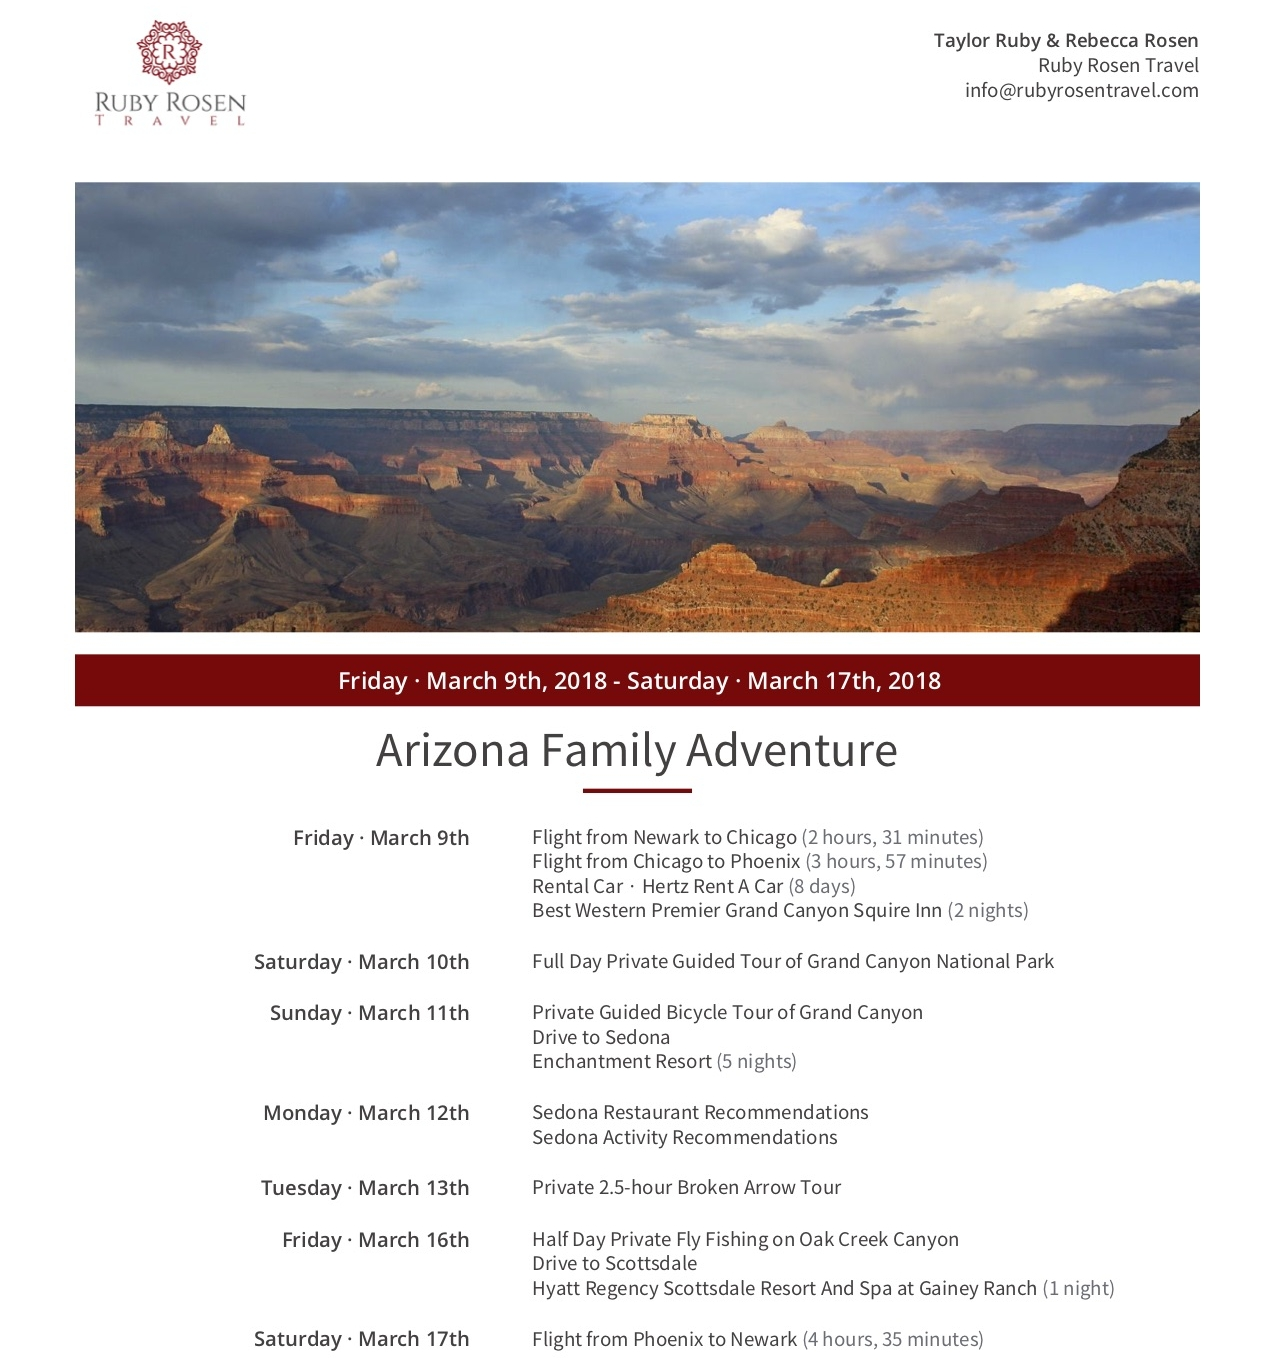 Arizona Family Adventure 1.jpg